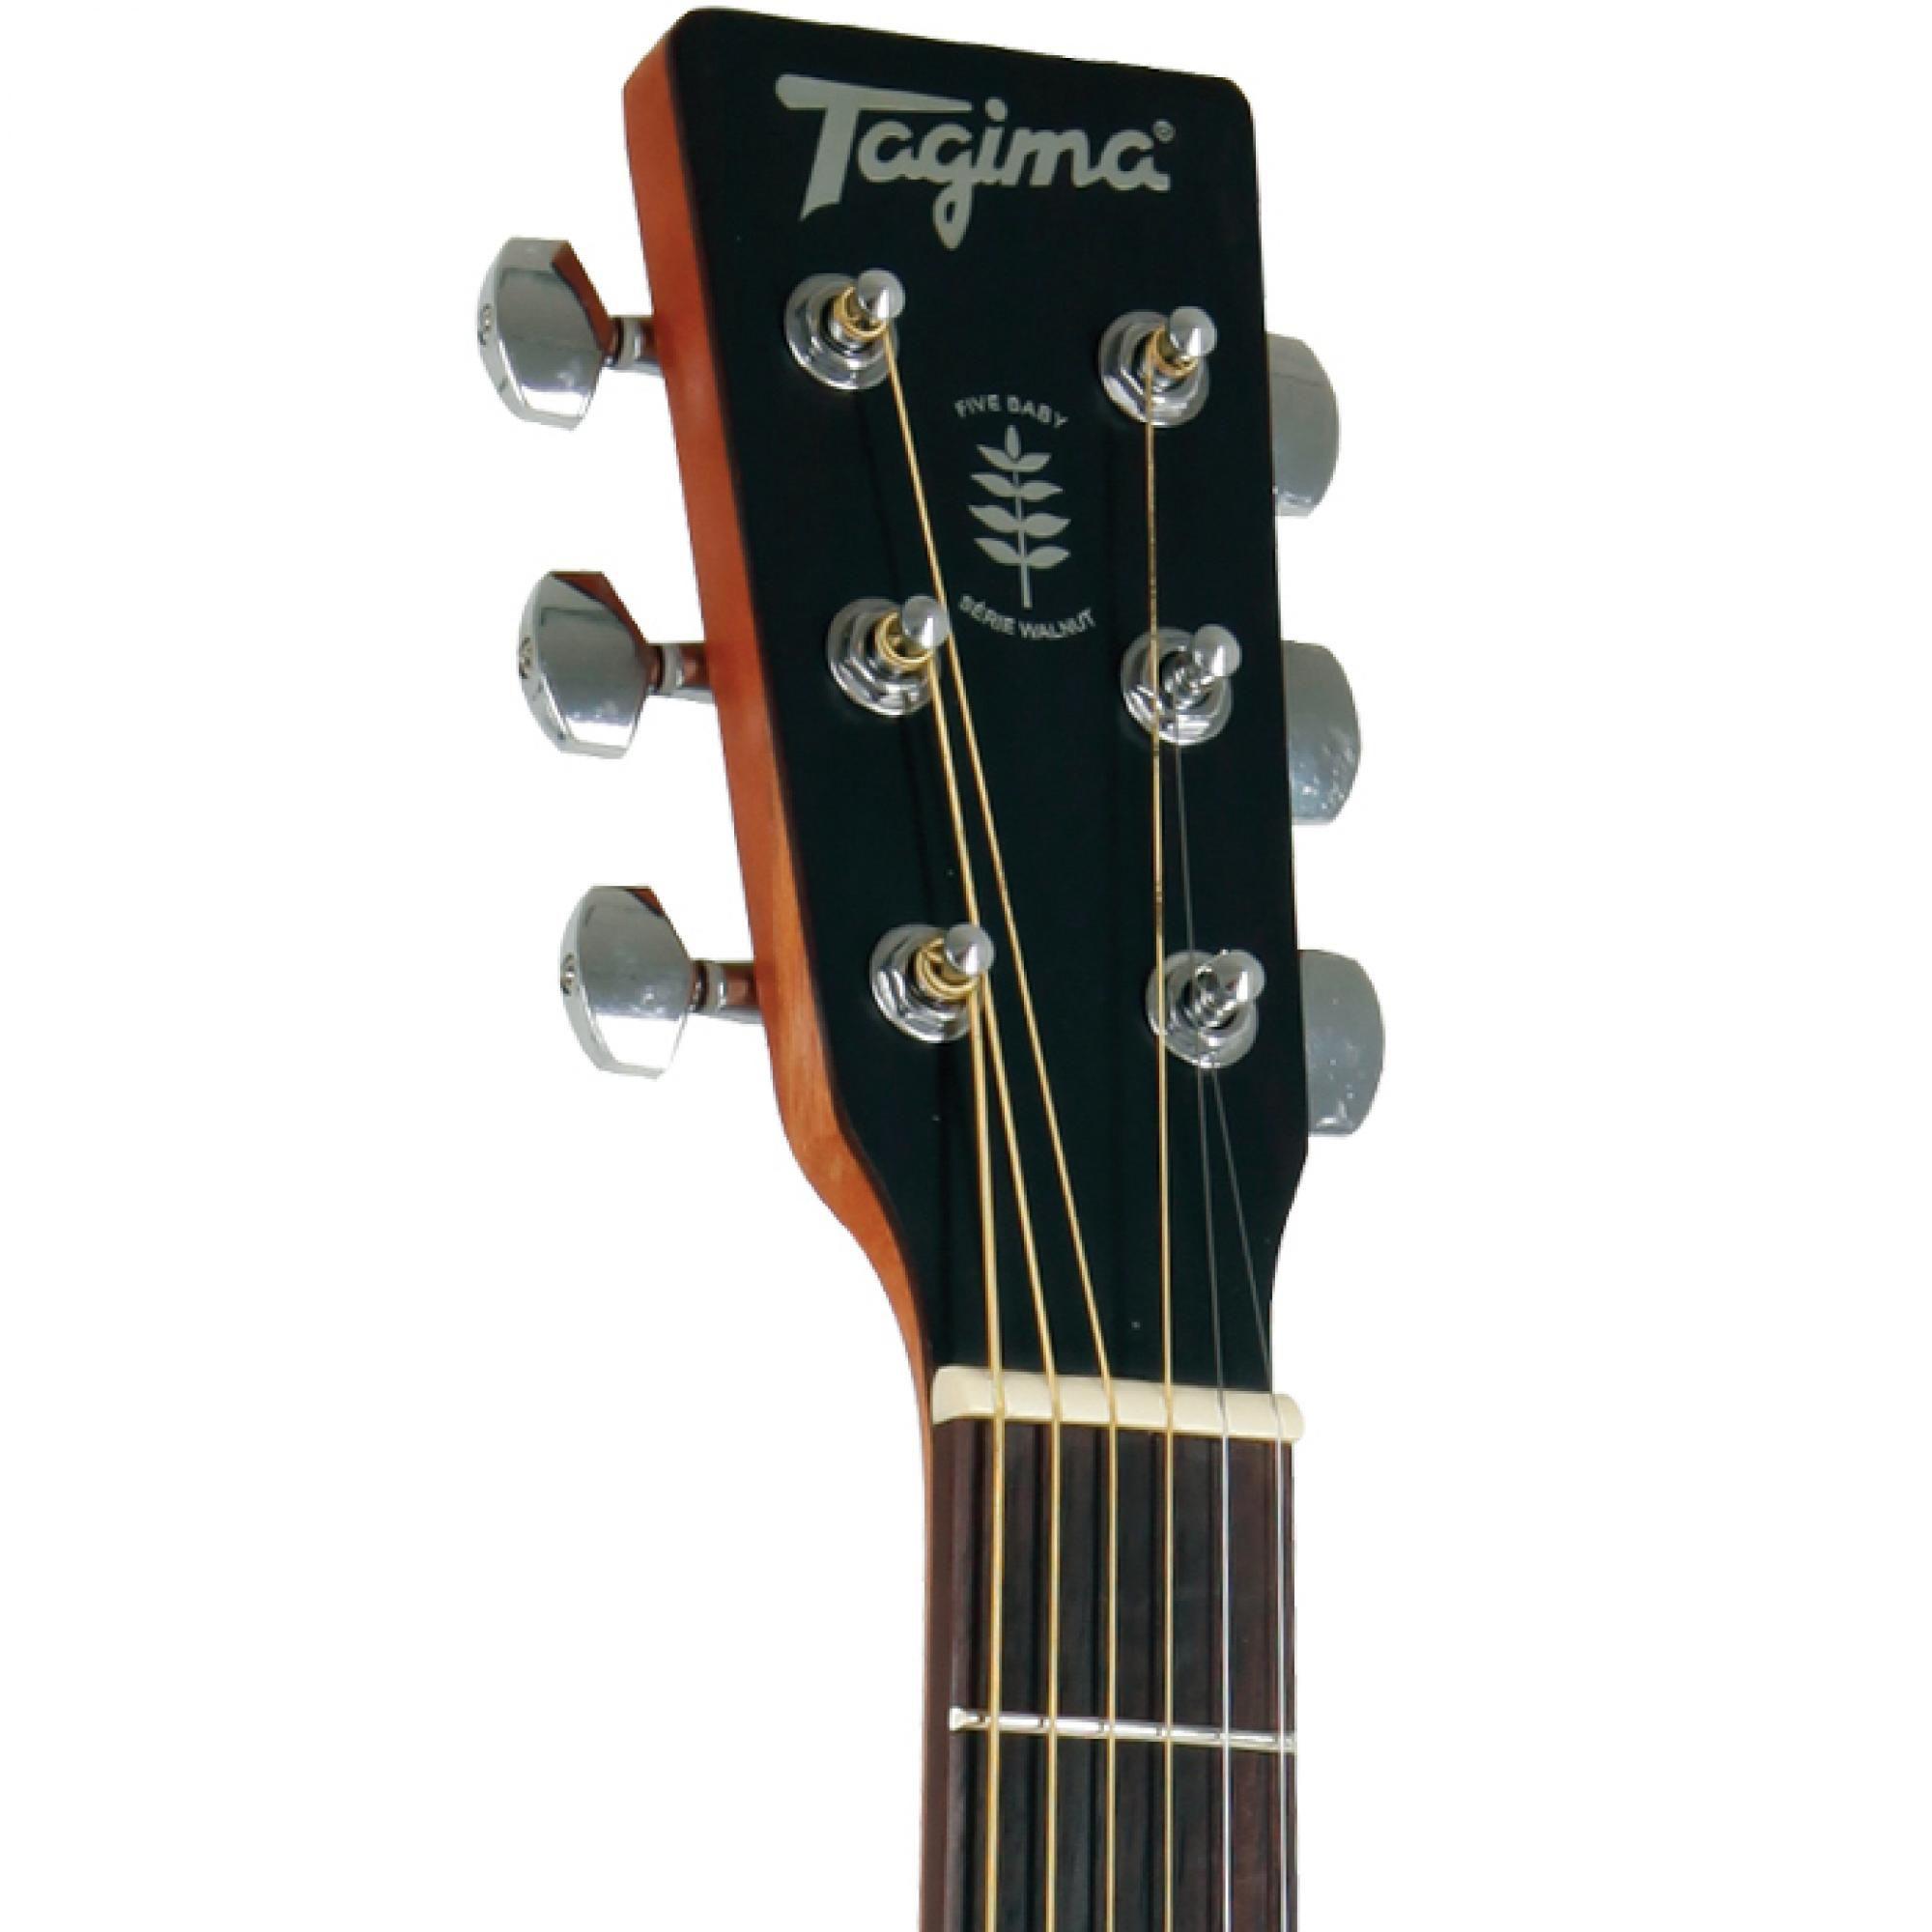 Violão Tagima Walnut Two Folk Natural Eletroacústico